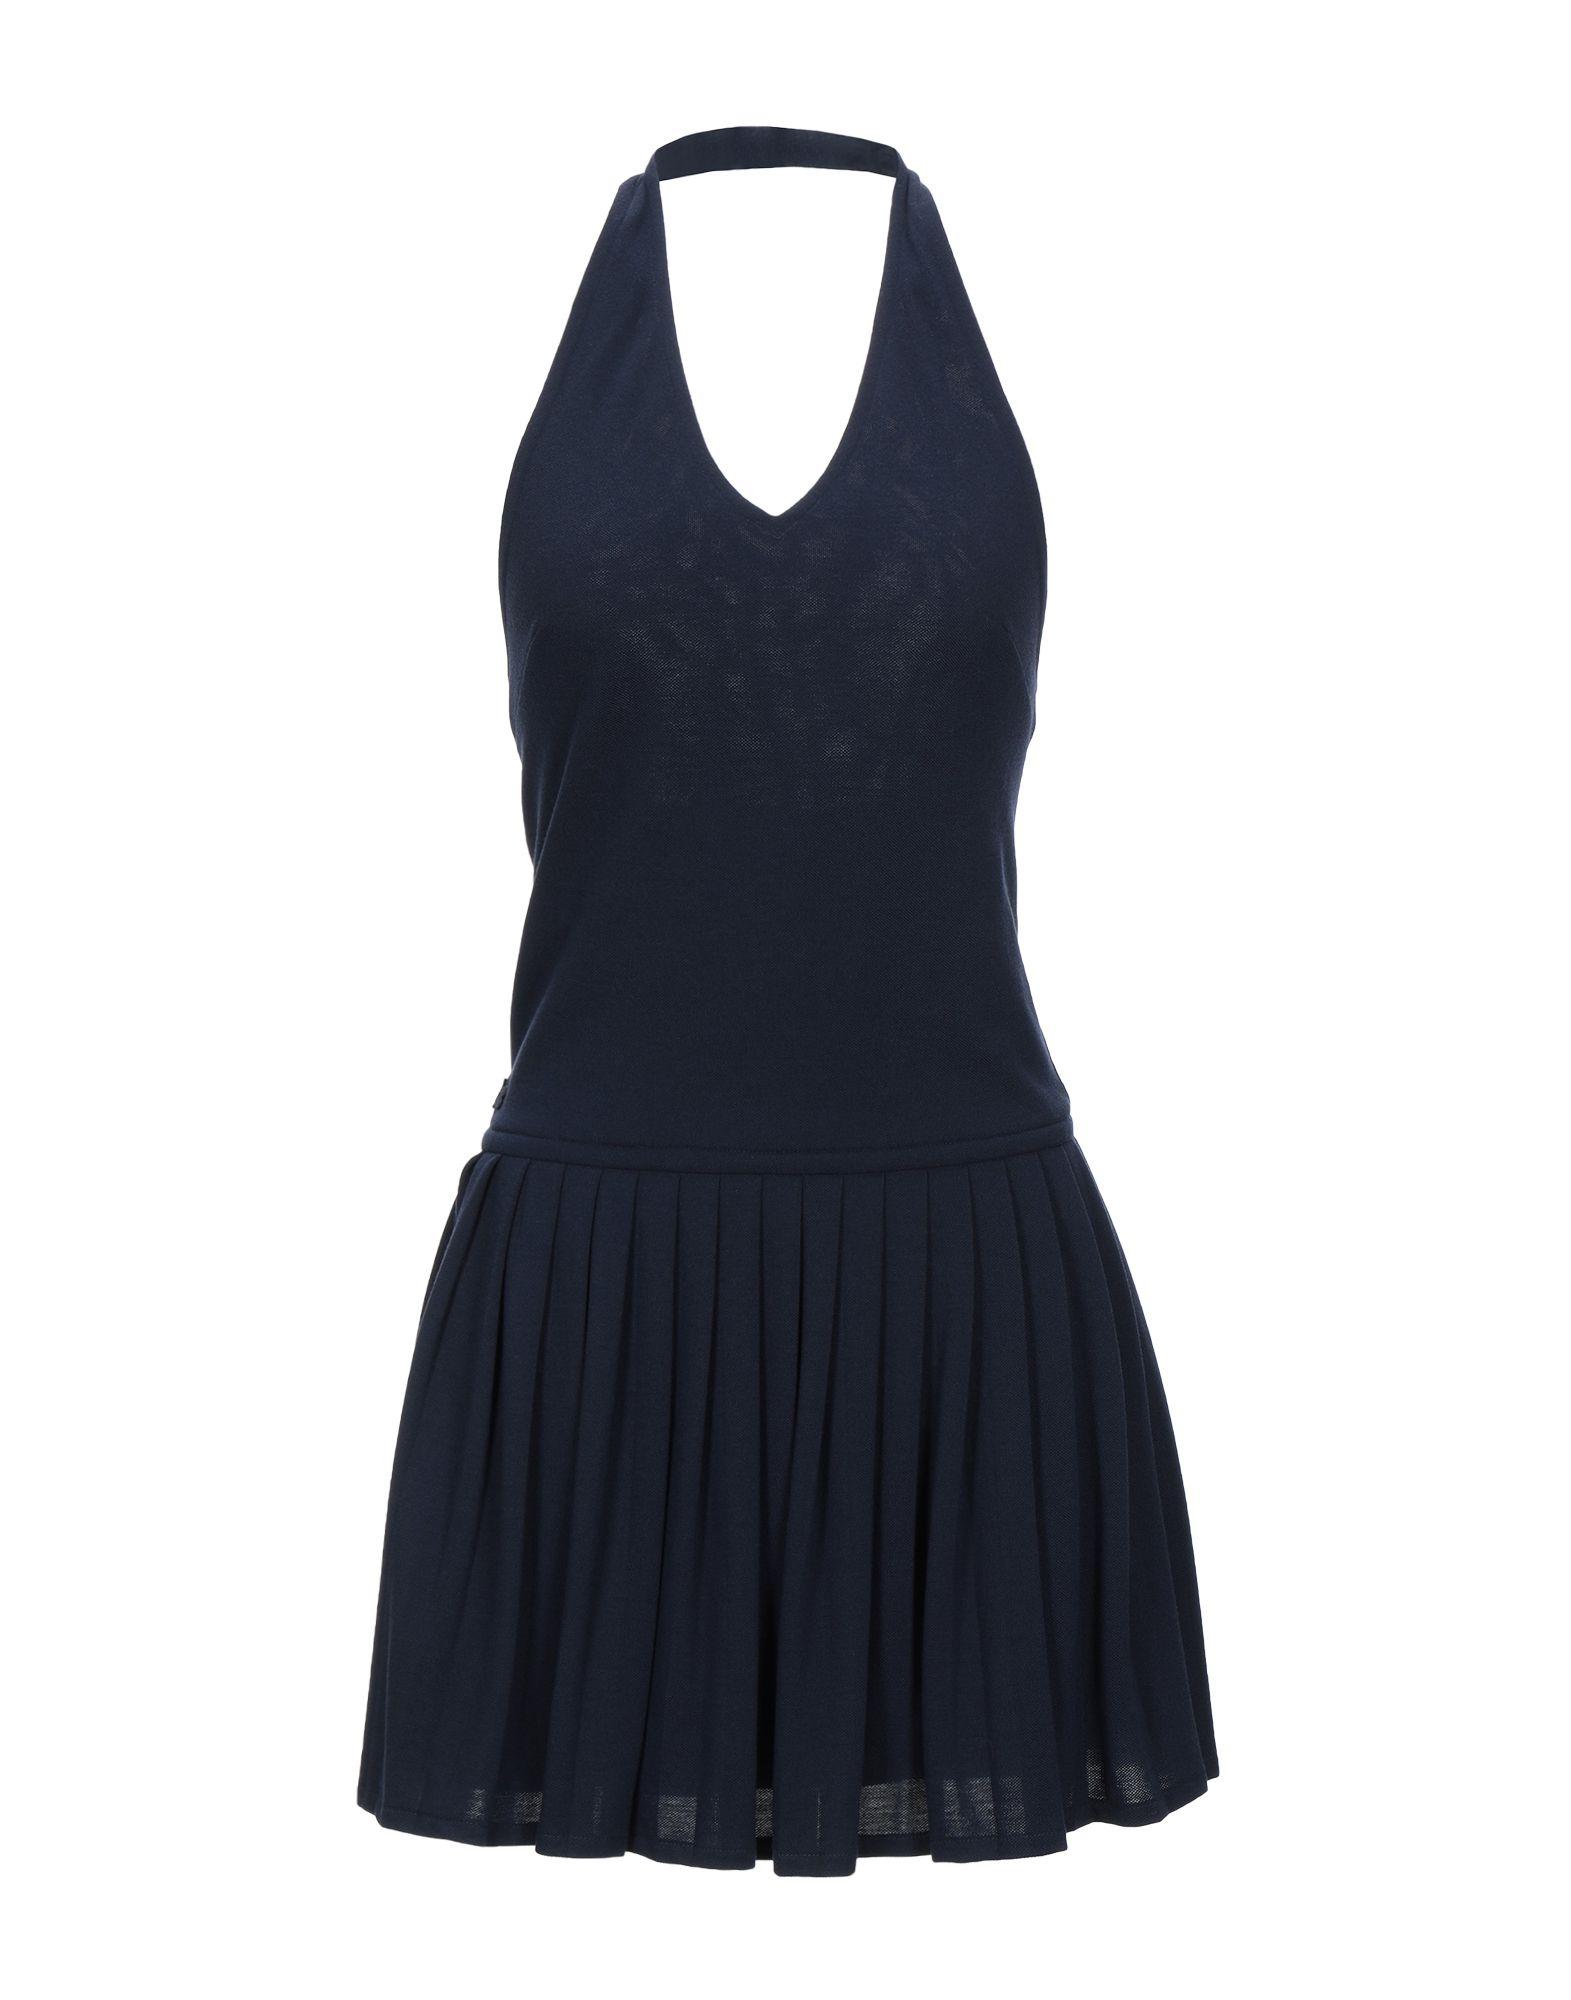 LACOSTE Короткое платье платье lacoste ef892536lt